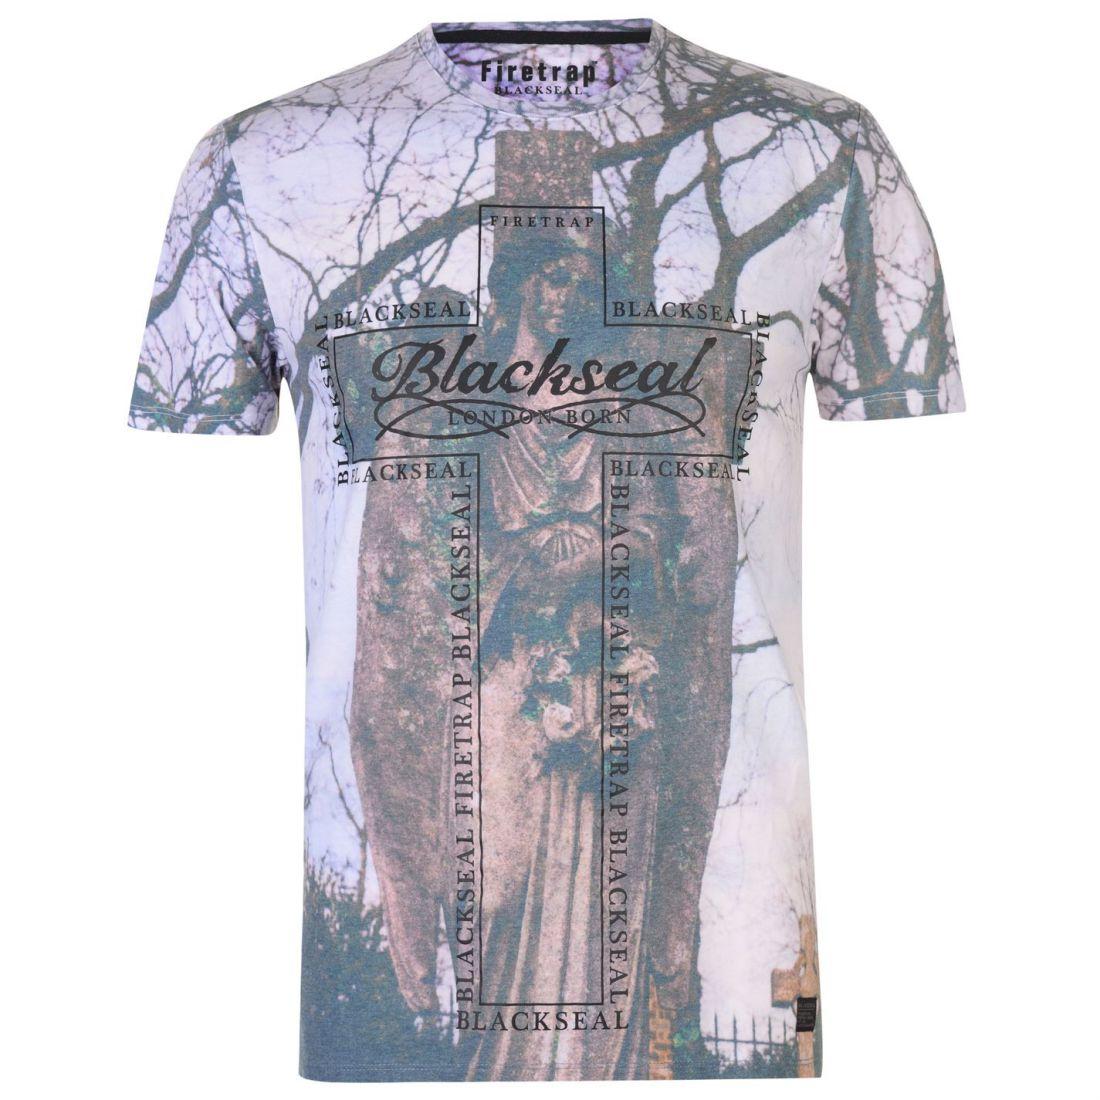 Crew Neck Firetrap T Mens Shirt Ebay Graveyad qaIxx10wt